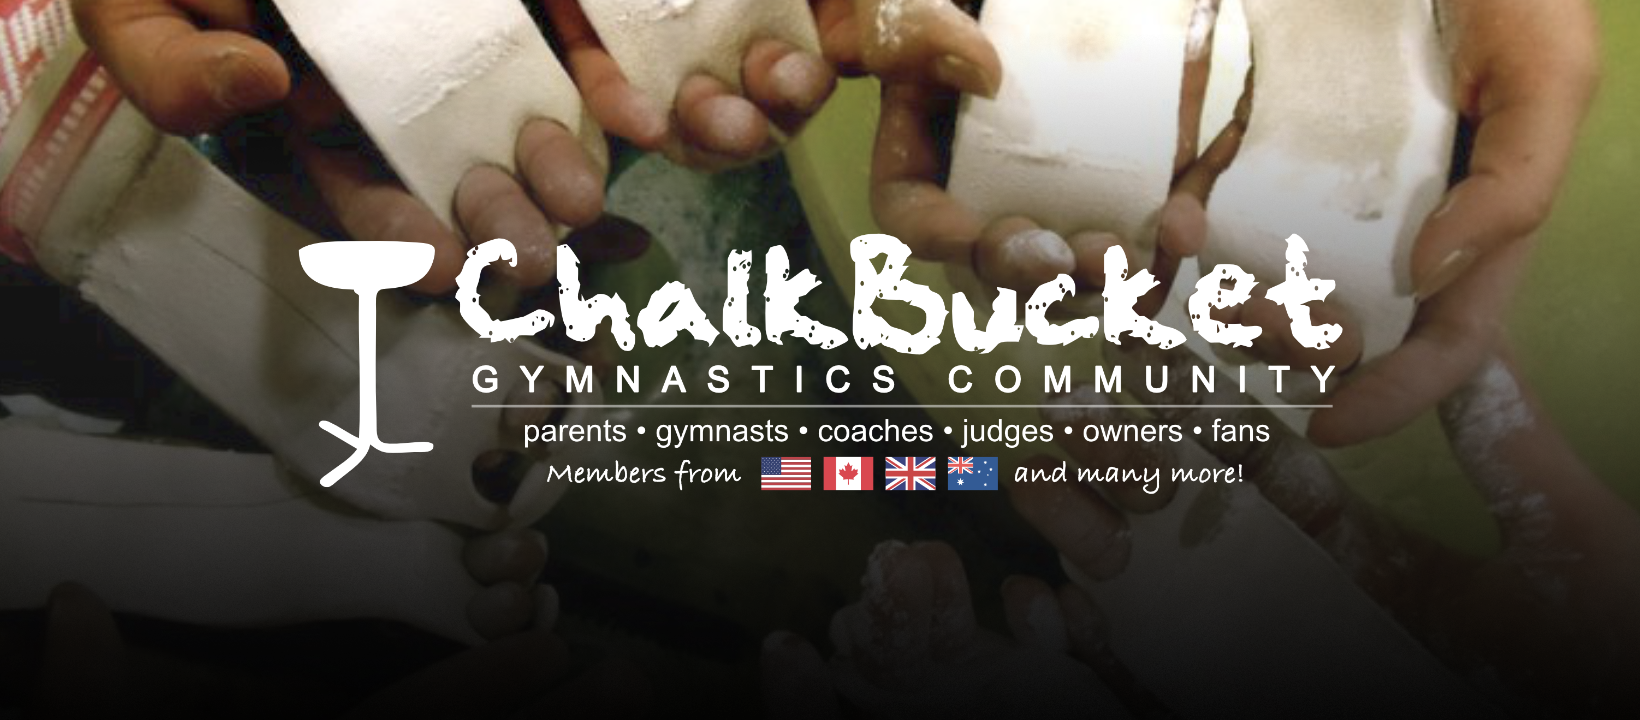 www.chalkbucket.com